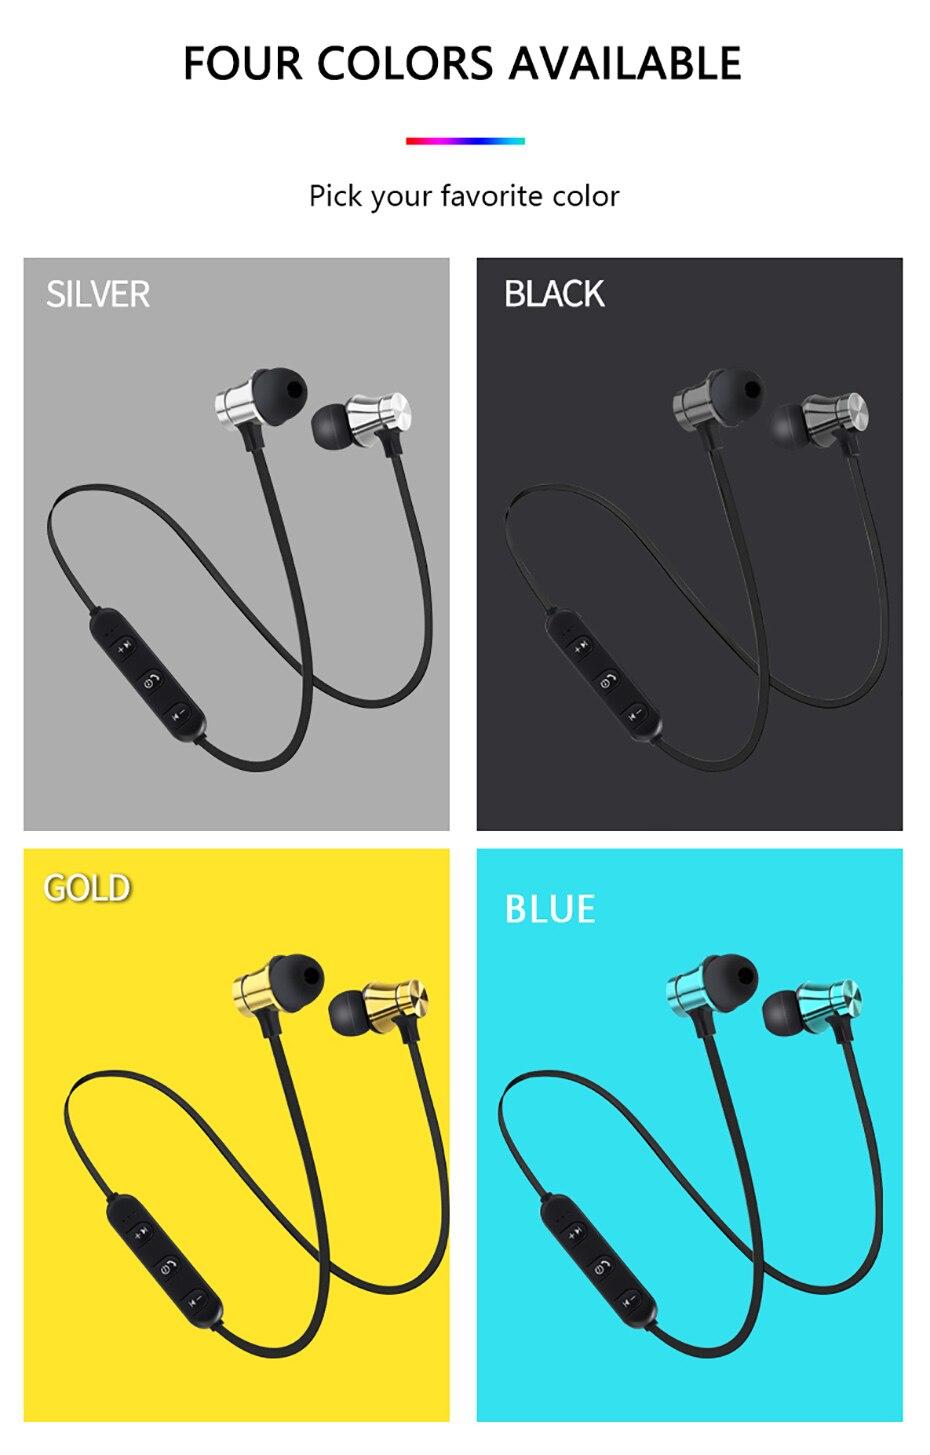 Newest Wireless Headphone Bluetooth Earphone Headphone For Phone Neckband sport earphone Auriculare CSR Bluetooth For Smart Phone 003